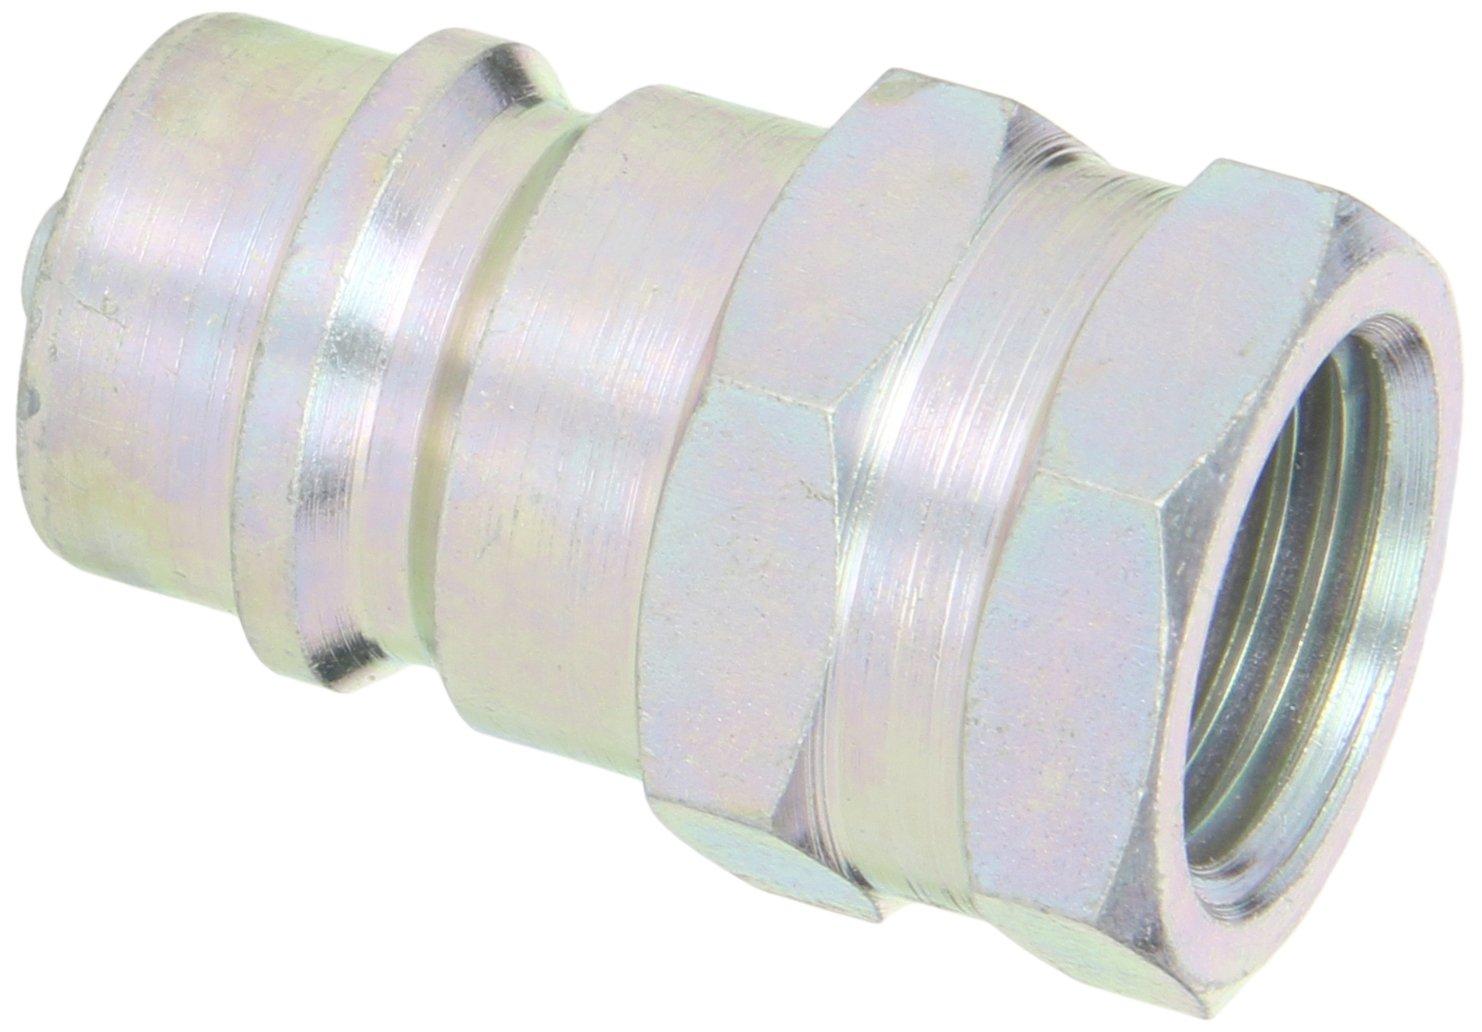 Dixon Valve K4F4 Steel ISO-A Interchange Hydraulic Fitting, Nipple, 1/2'' Coupling x 1/2'' - 14 NPTF Female Thread by Dixon Valve & Coupling (Image #1)